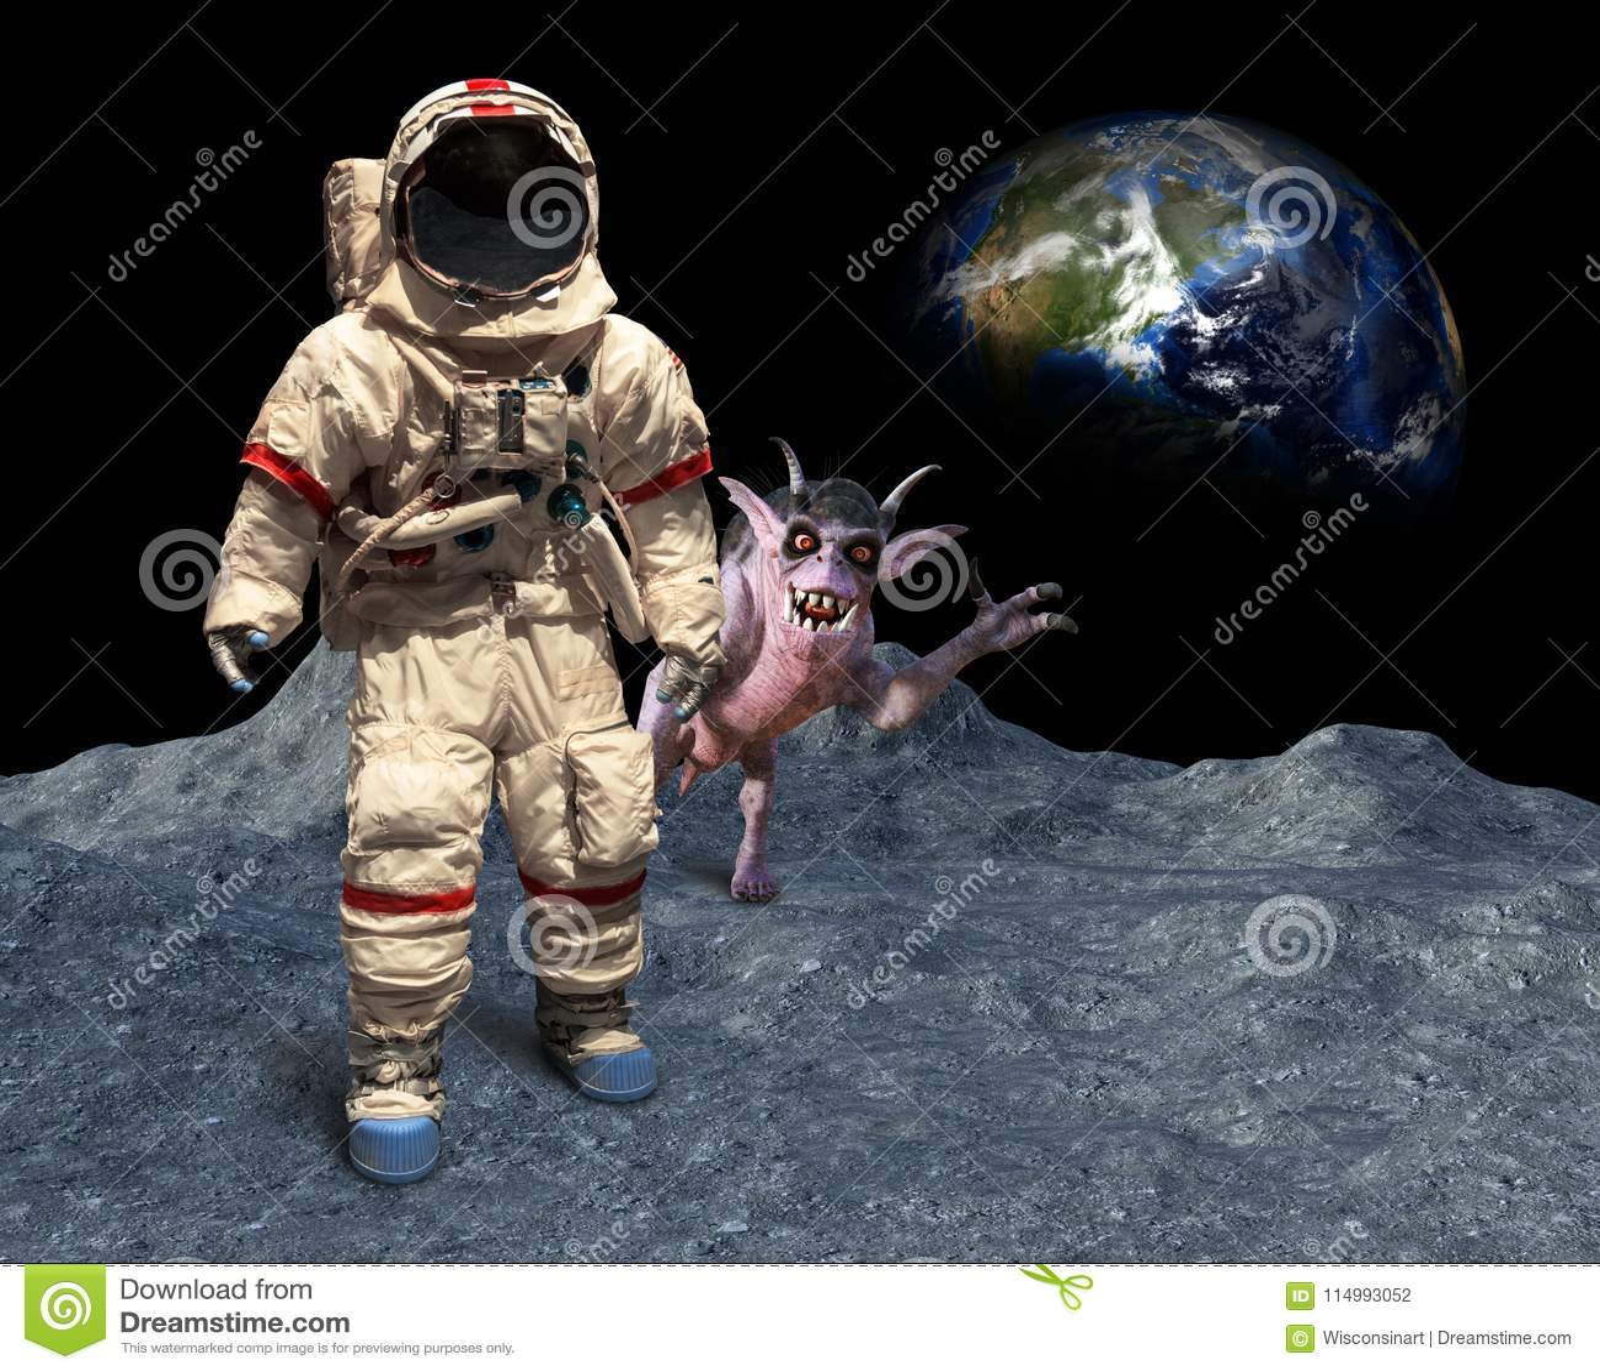 Alien Astronaut Space Moon Stock Photos - Download 112 Images